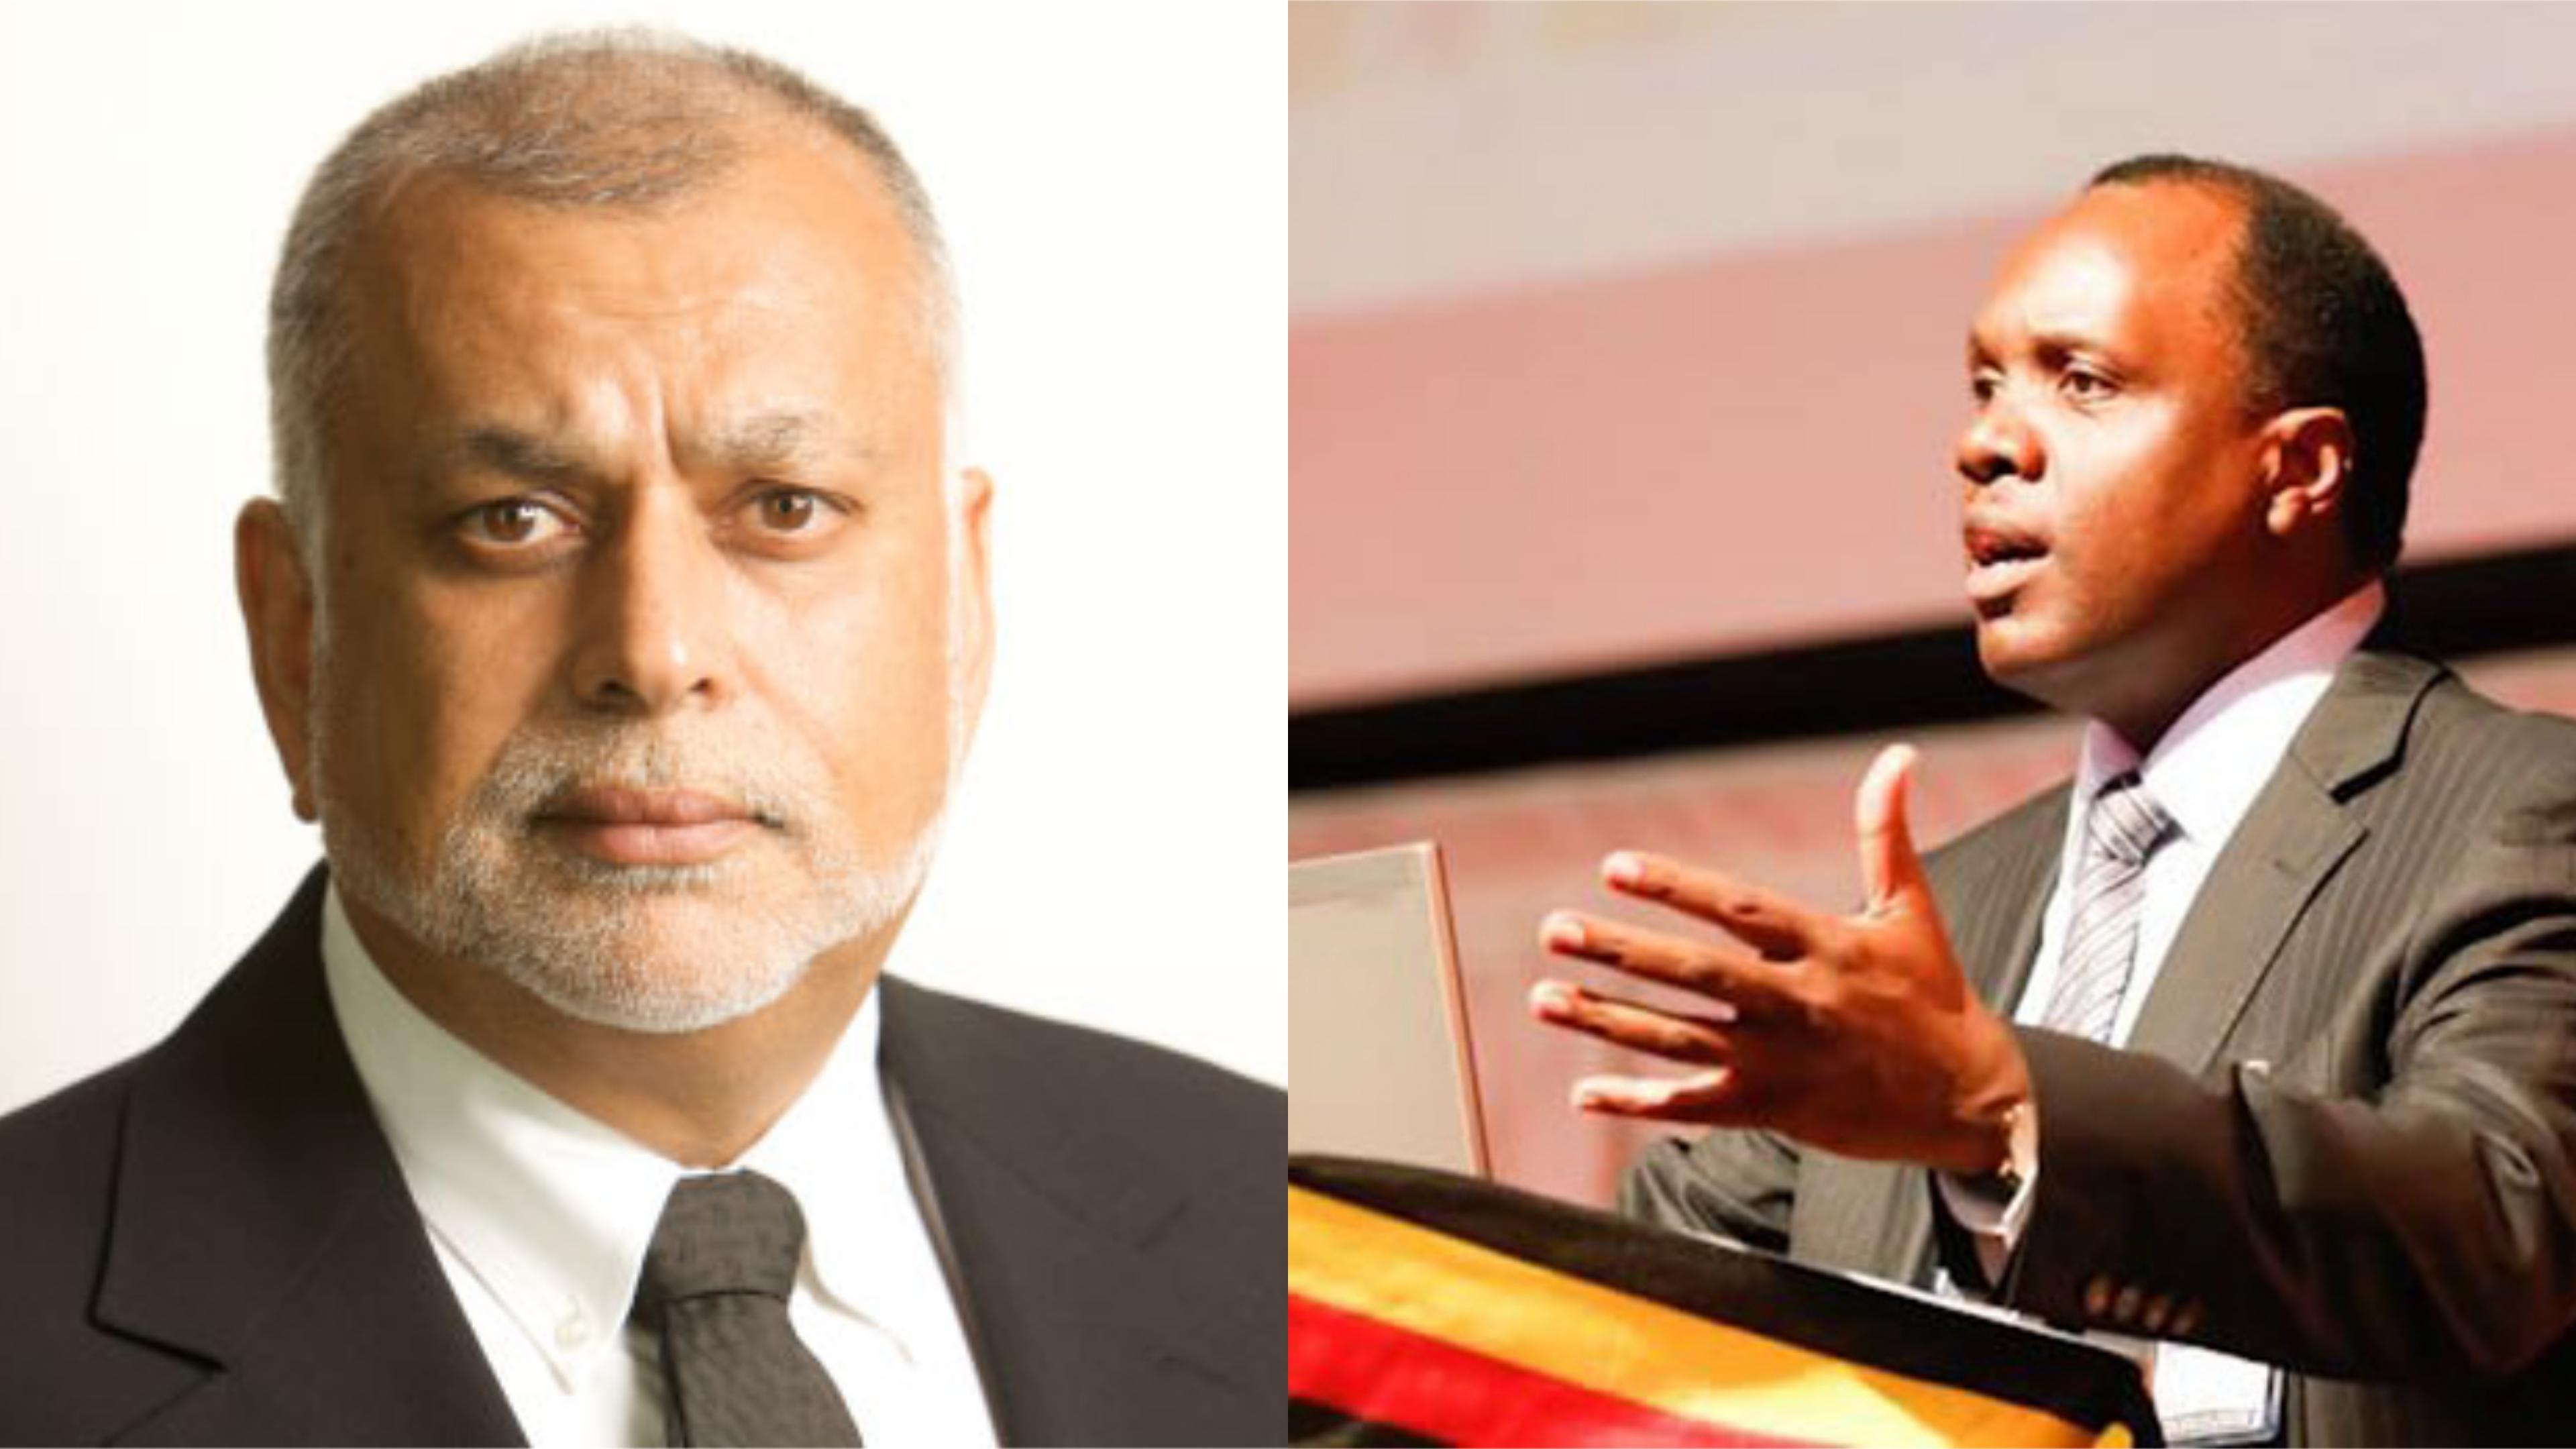 Uganda Businessman, Patrick Bitature (R) has praised Sudhir Ruperalia for mentoring him into business (FILE PHOTO)